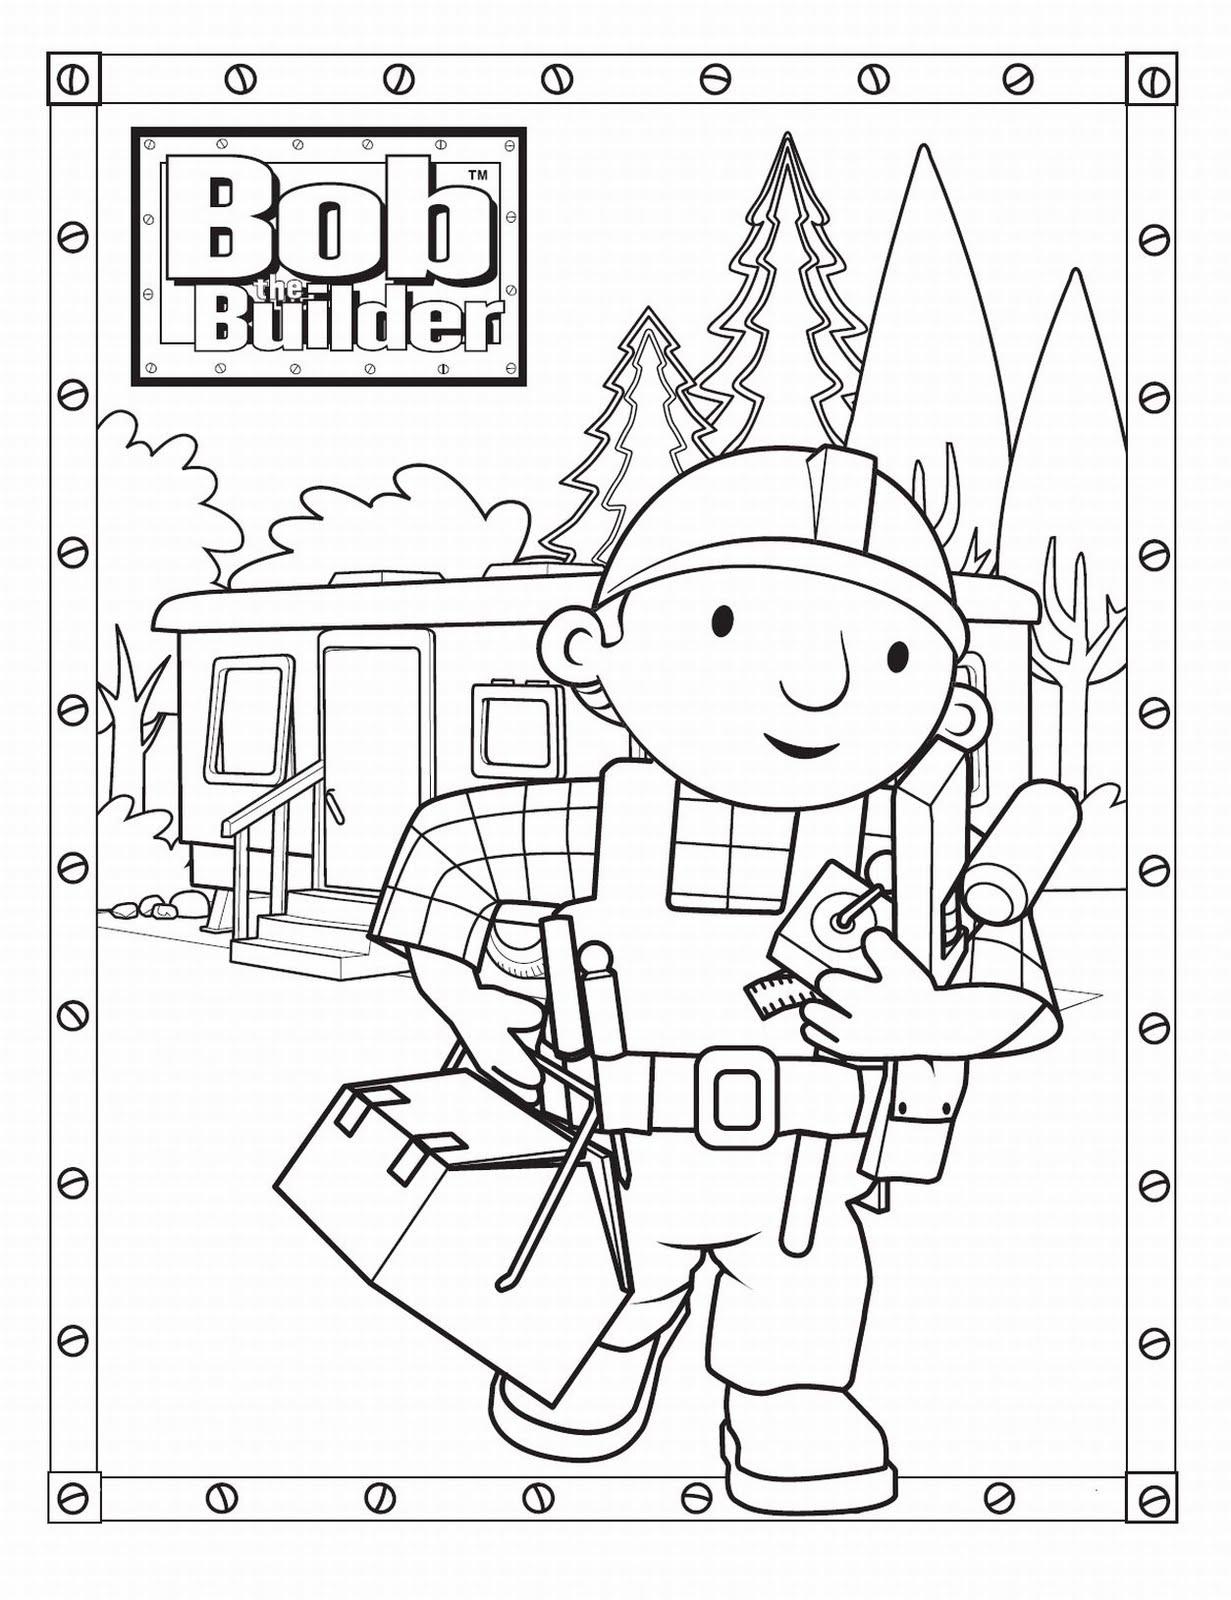 Desenhos para imprimir bob o construtor para colorir for Bob the builder coloring pages printable